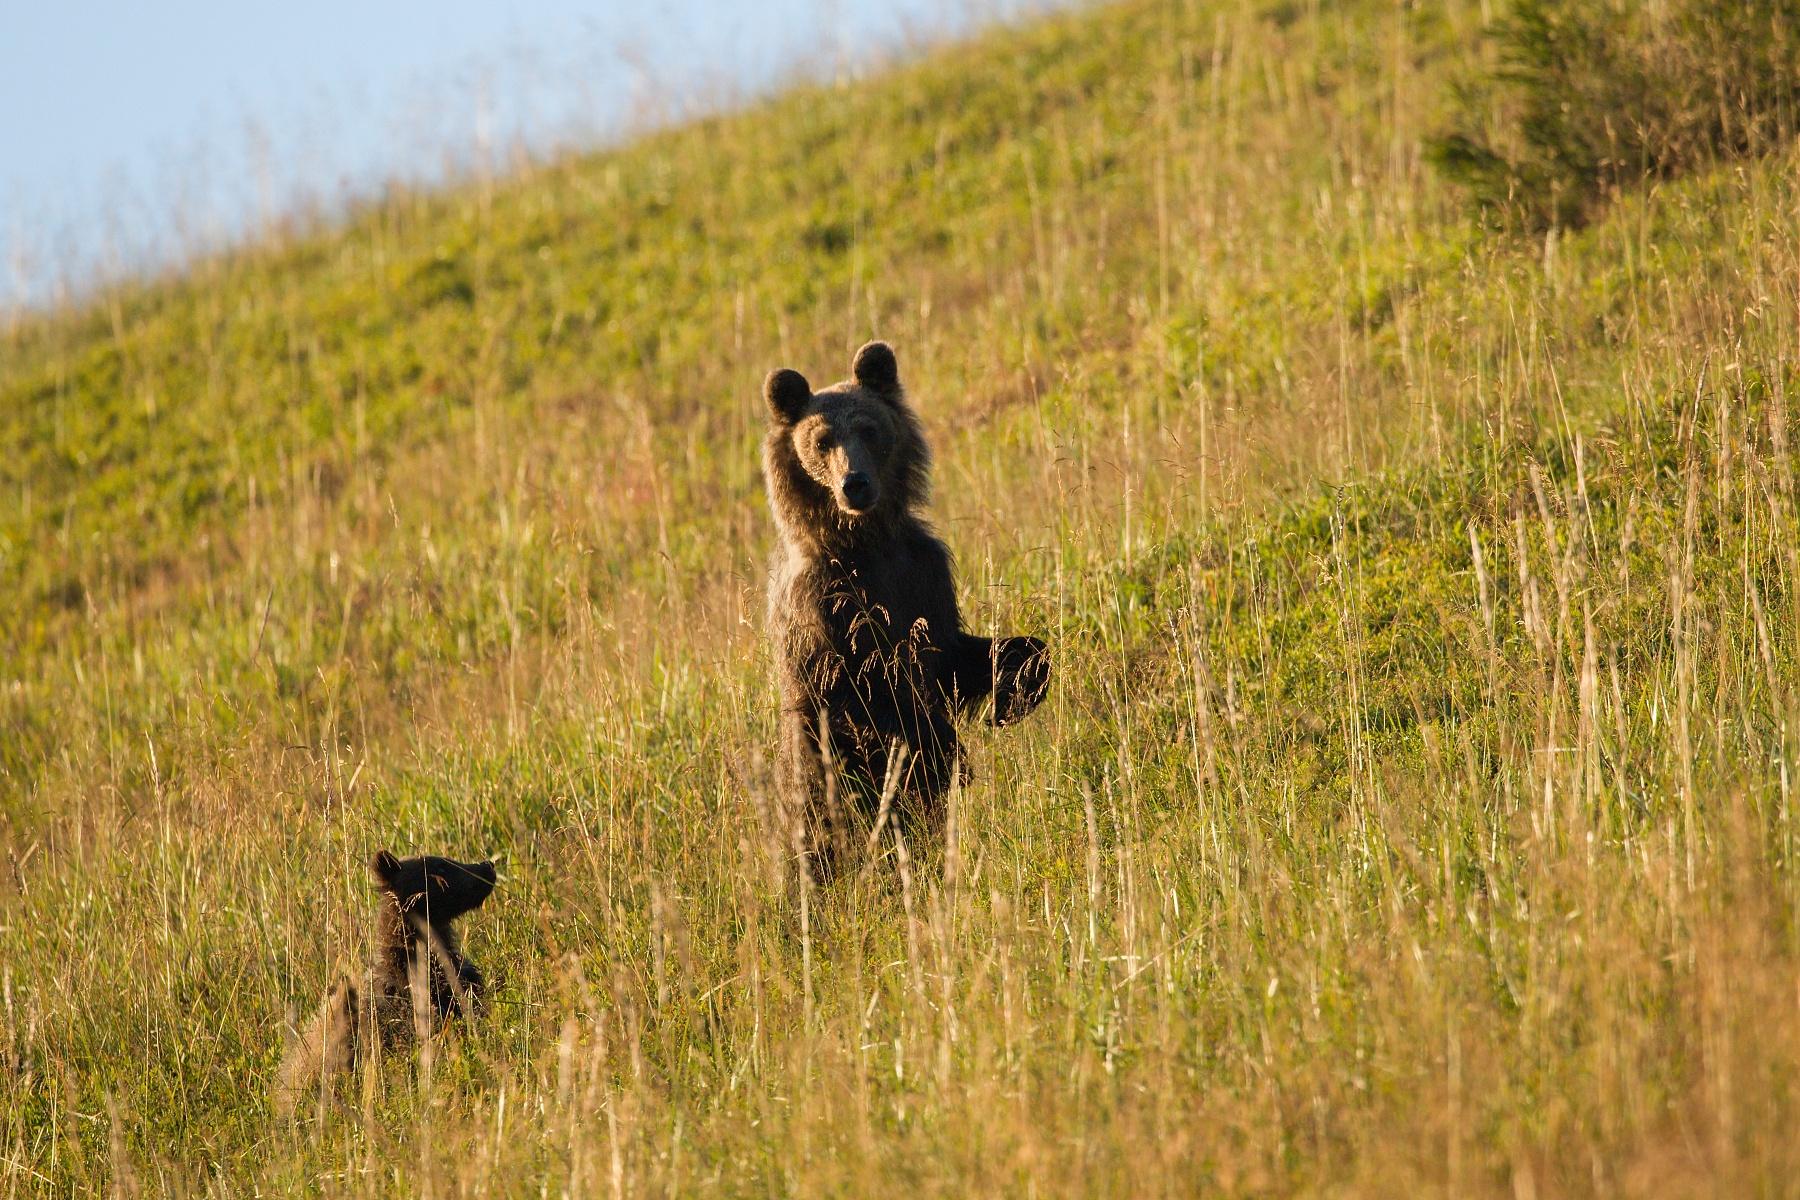 medveď hnedý (Ursus arctos) Brown bear, Veľká Fatra, Slovensko <br /> Canon EOS 6D mark II, Canon 100-400mm, f4.5-5.6 L IS II USM, 400 mm, 1/800, f6.3, ISO 800, 21. august 2020